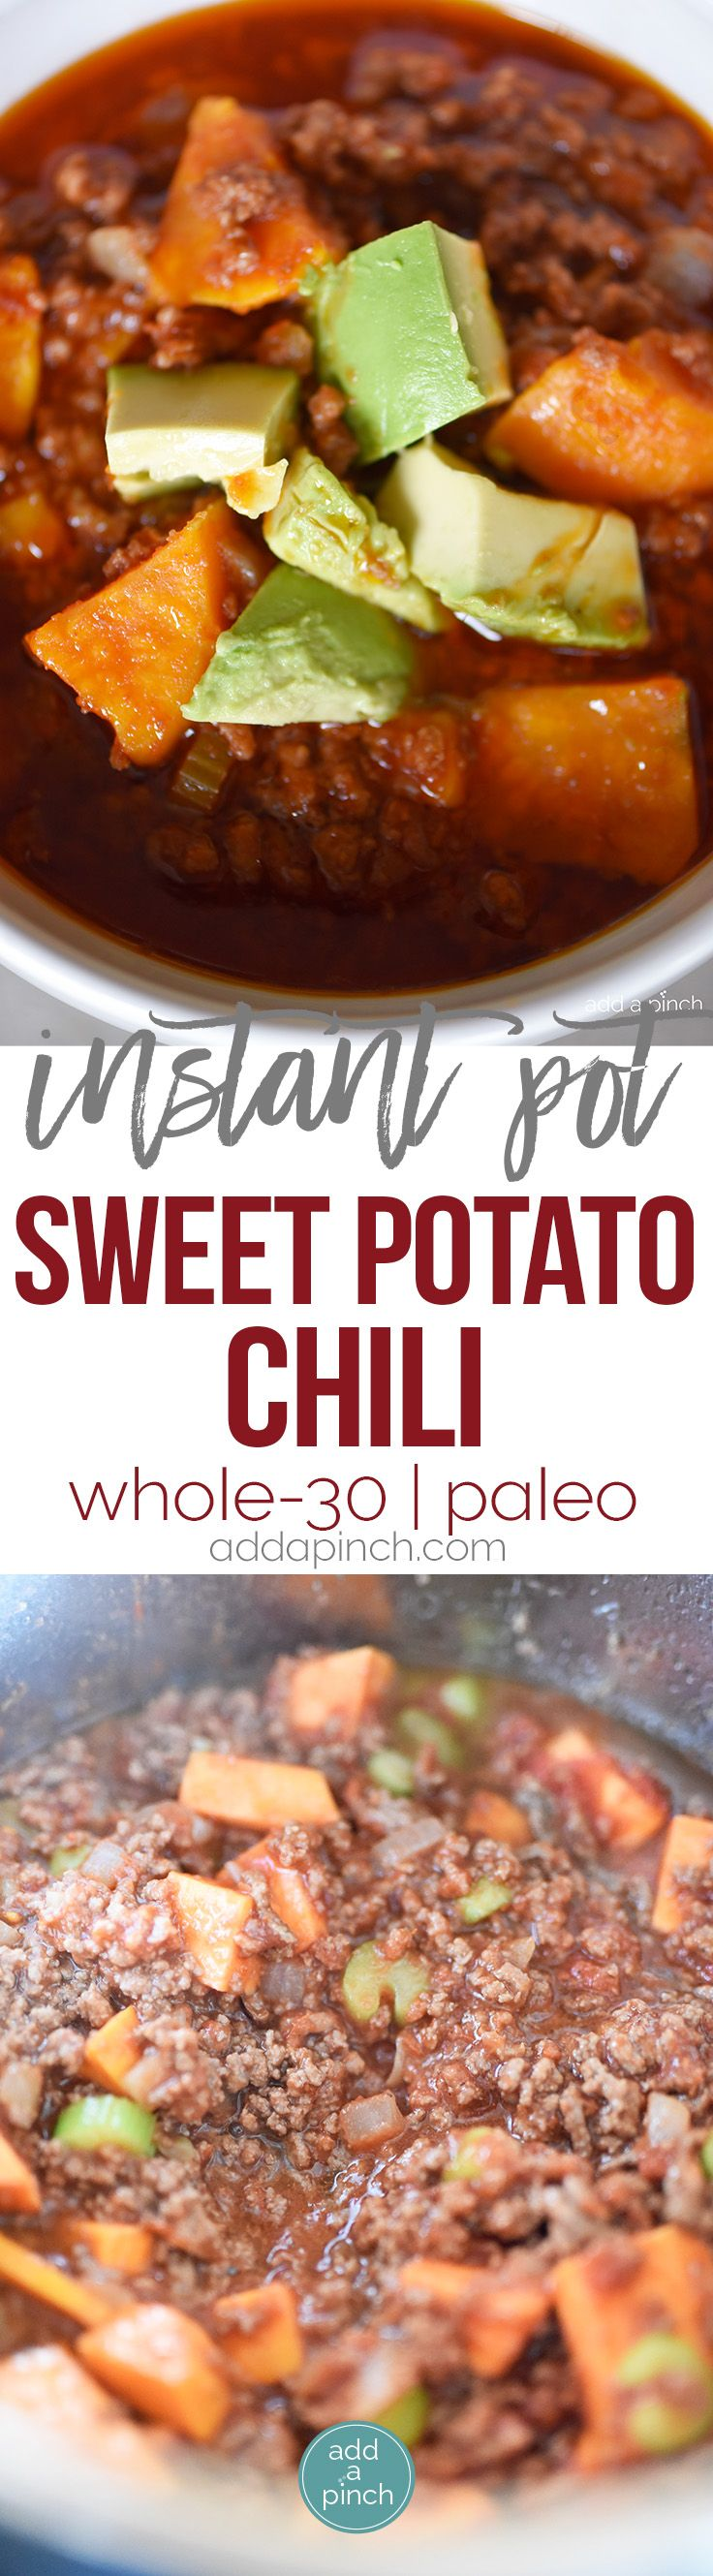 Instant Pot Sweet Potato Chili Recipe This Instant Pot Sweet Potato Chili Makes A Hearty Deli Instant Pot Paleo Sweet Potato Chili Sweet Potato Chili Recipe